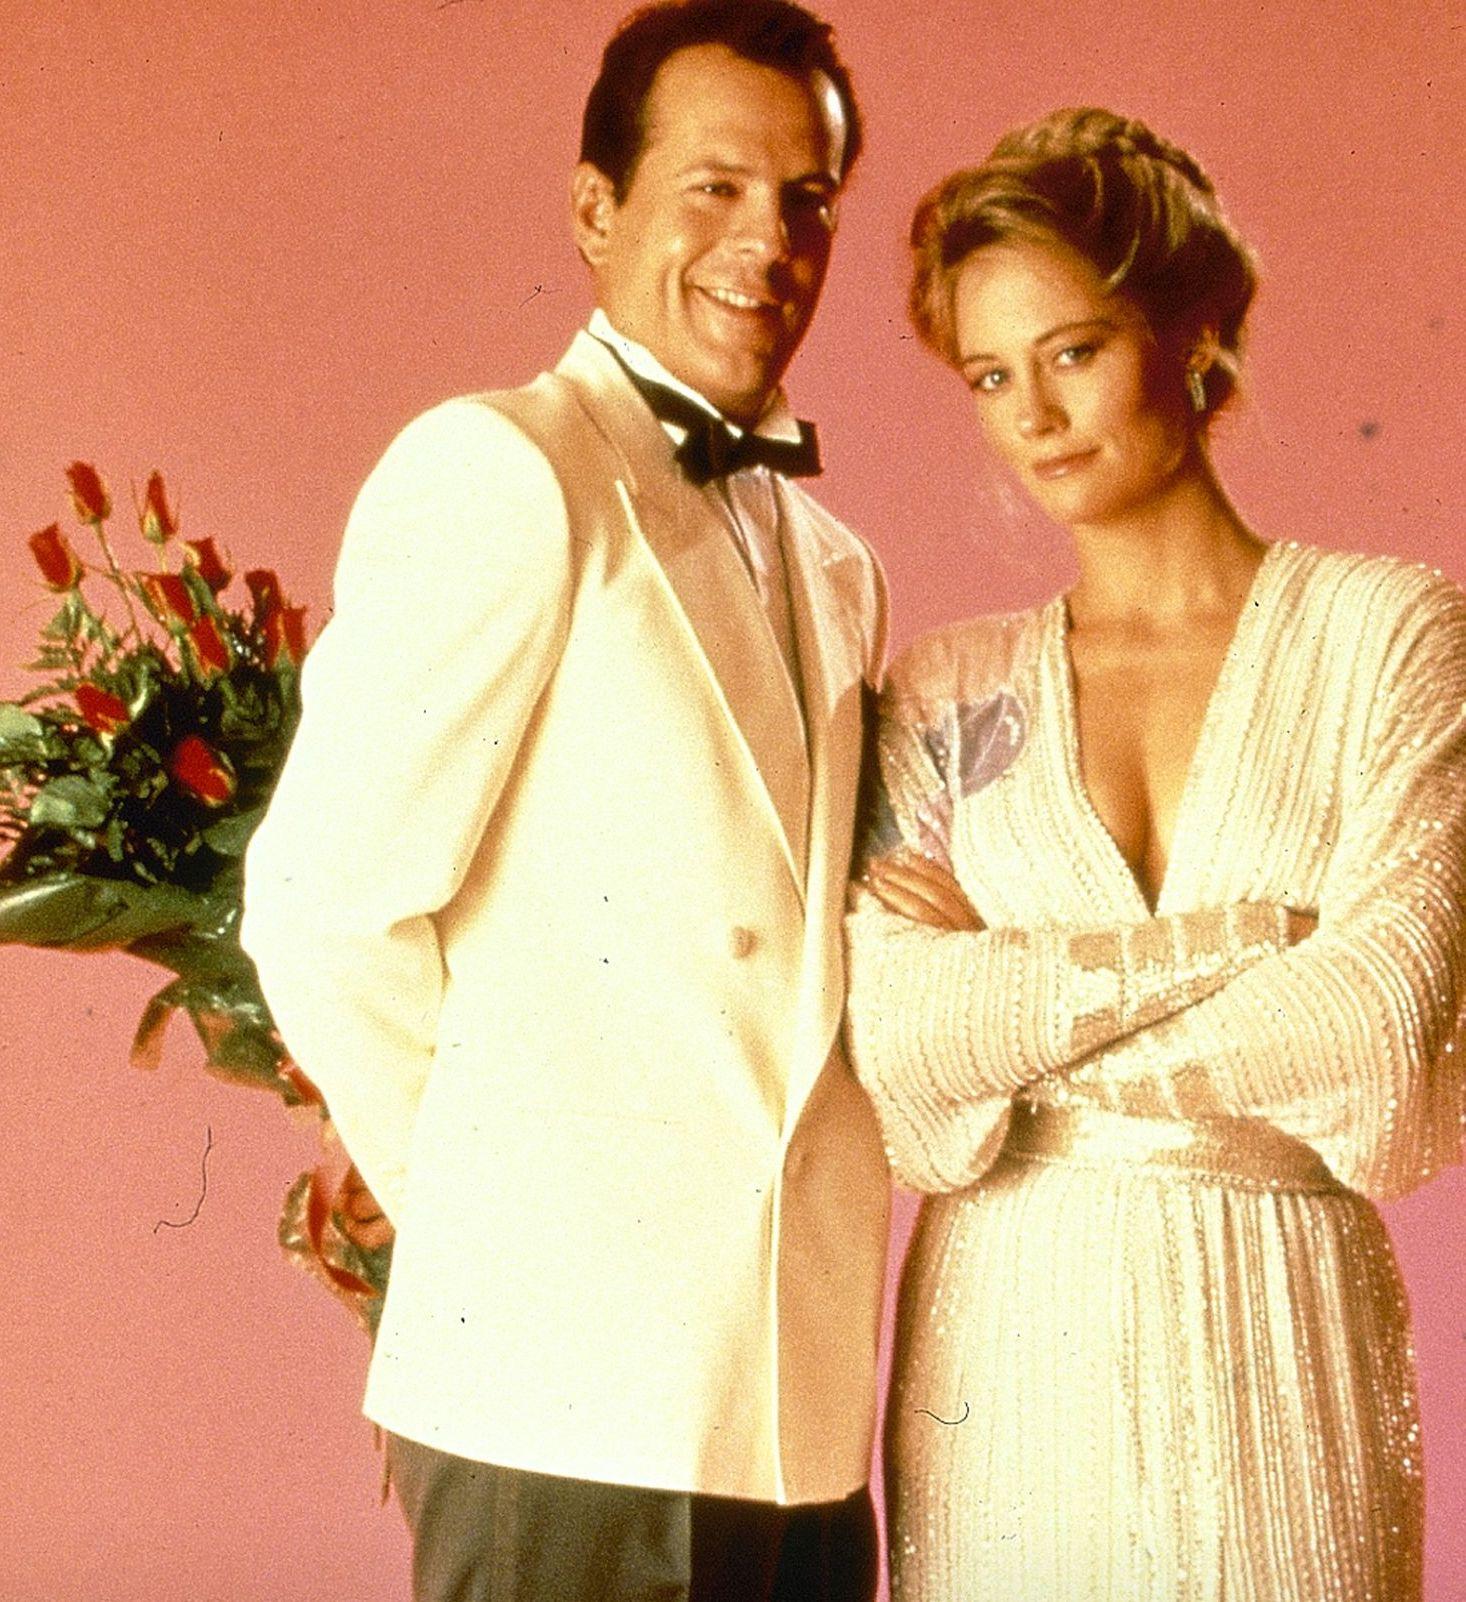 Bruce Willis as David Addison, Cybill Shepherd as Maddie Hayes, Moonlighting season 3